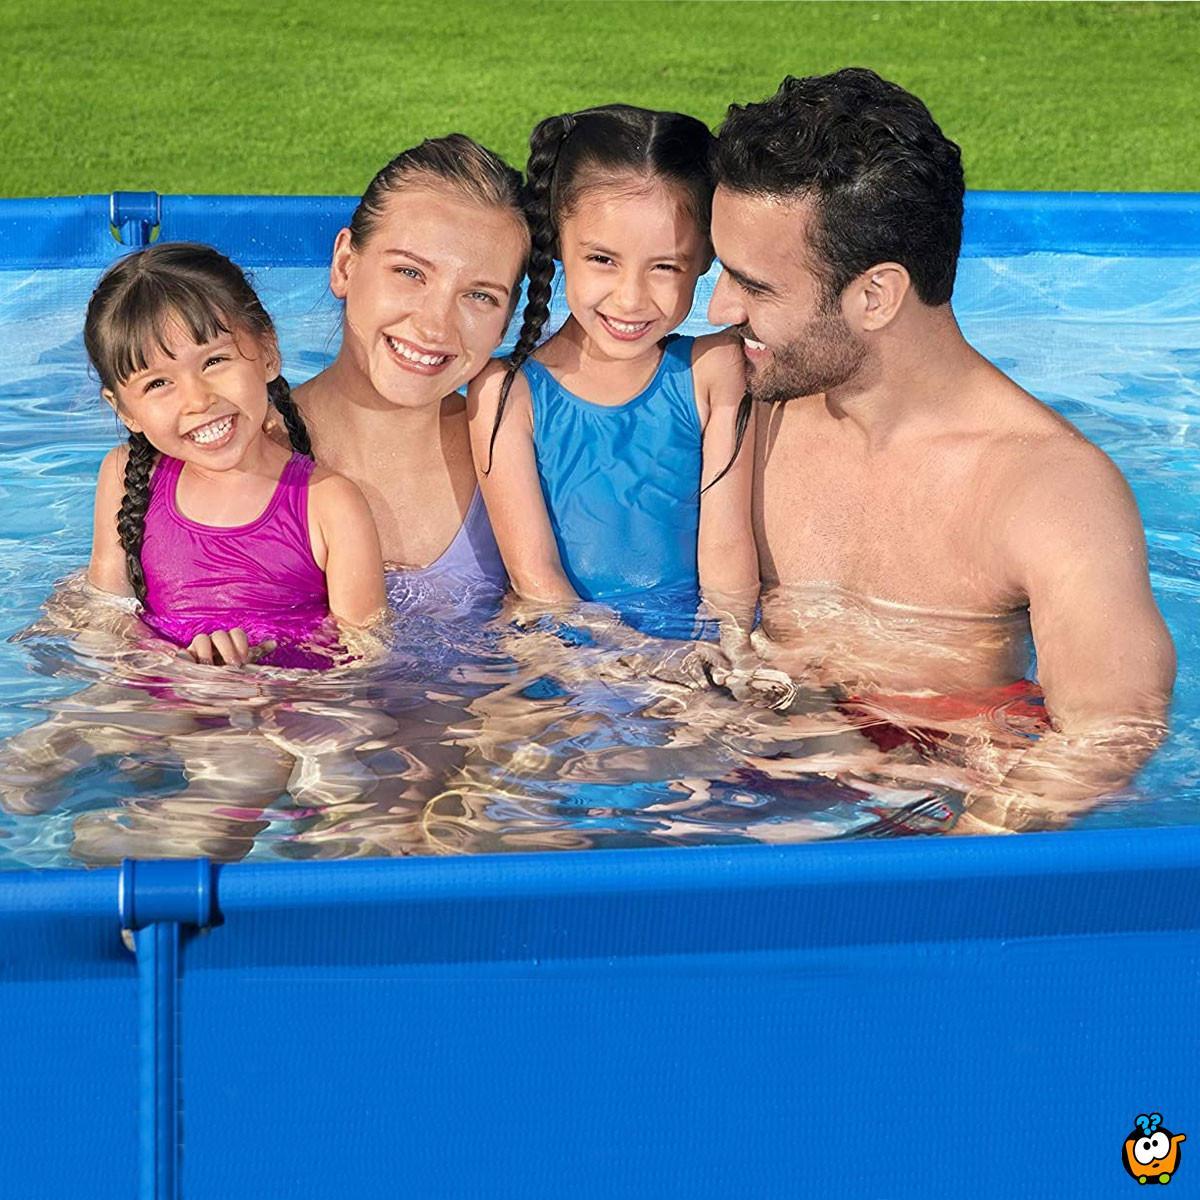 28270 Garden pool - Pravougaoni porodični bazen - 2,20m x 1,5m x 60cm